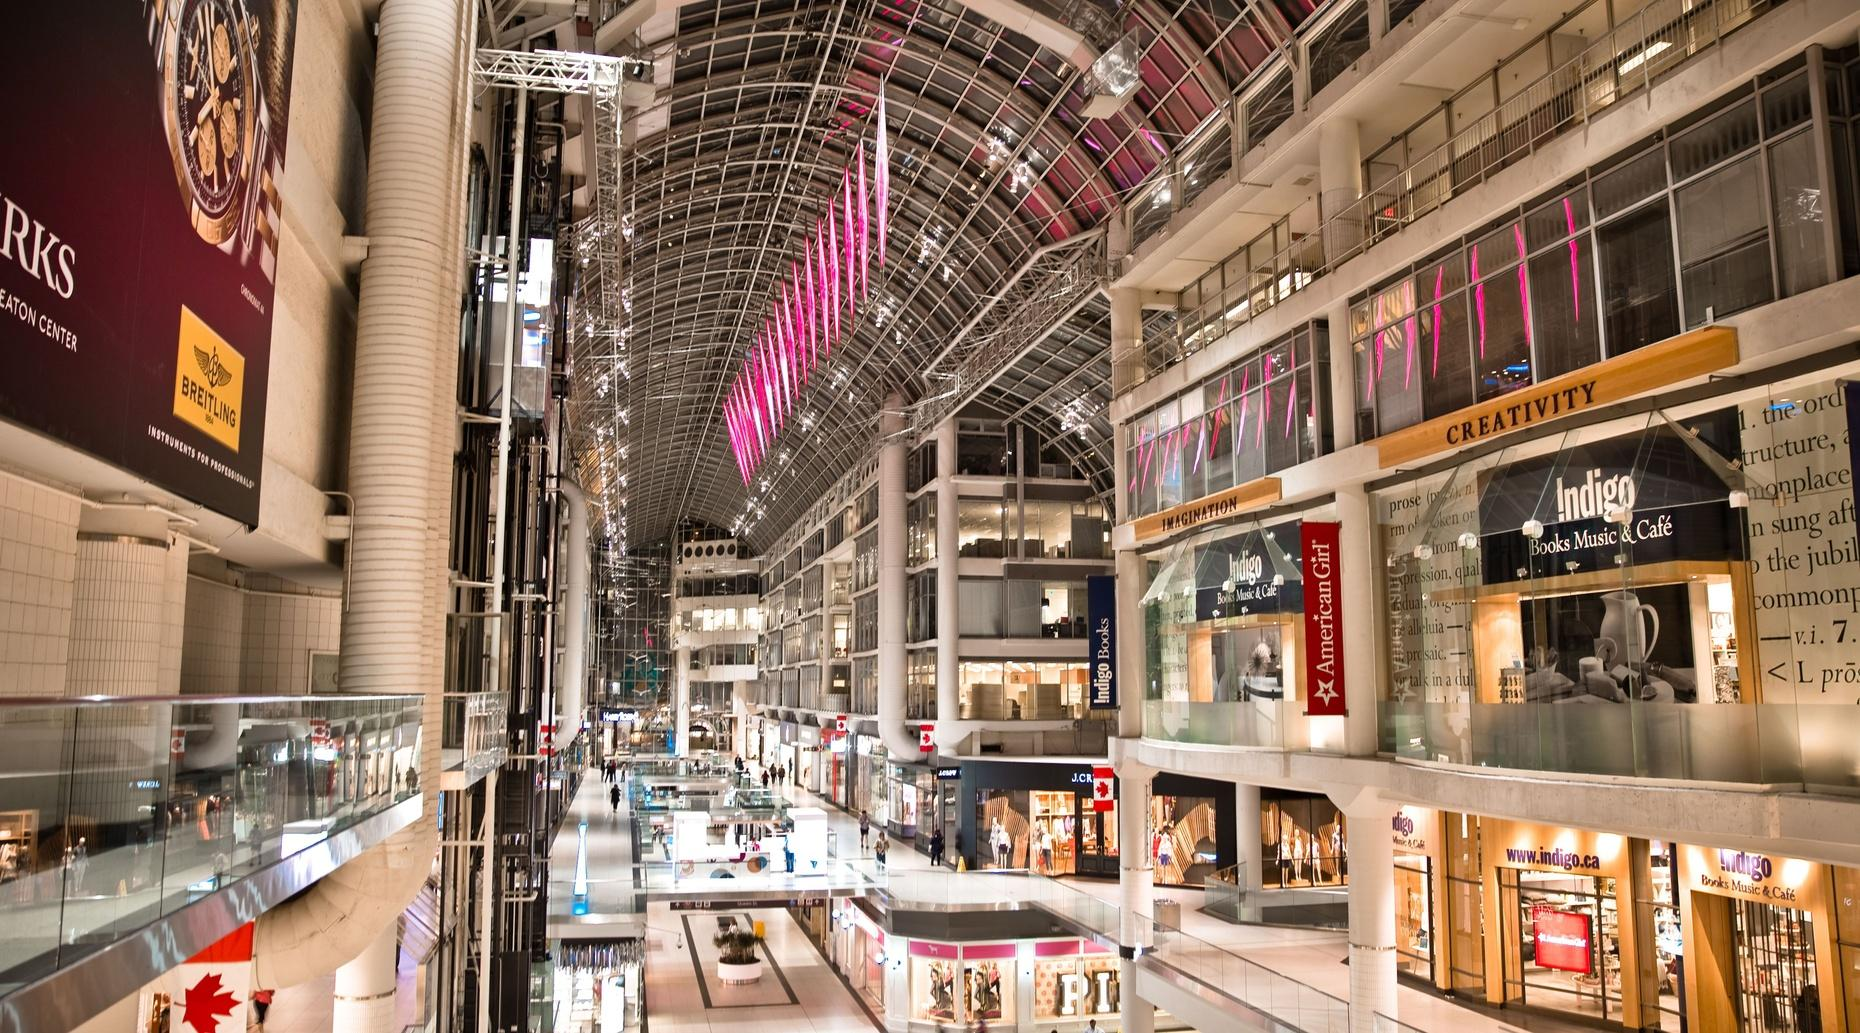 Toronto's Underground City Tour